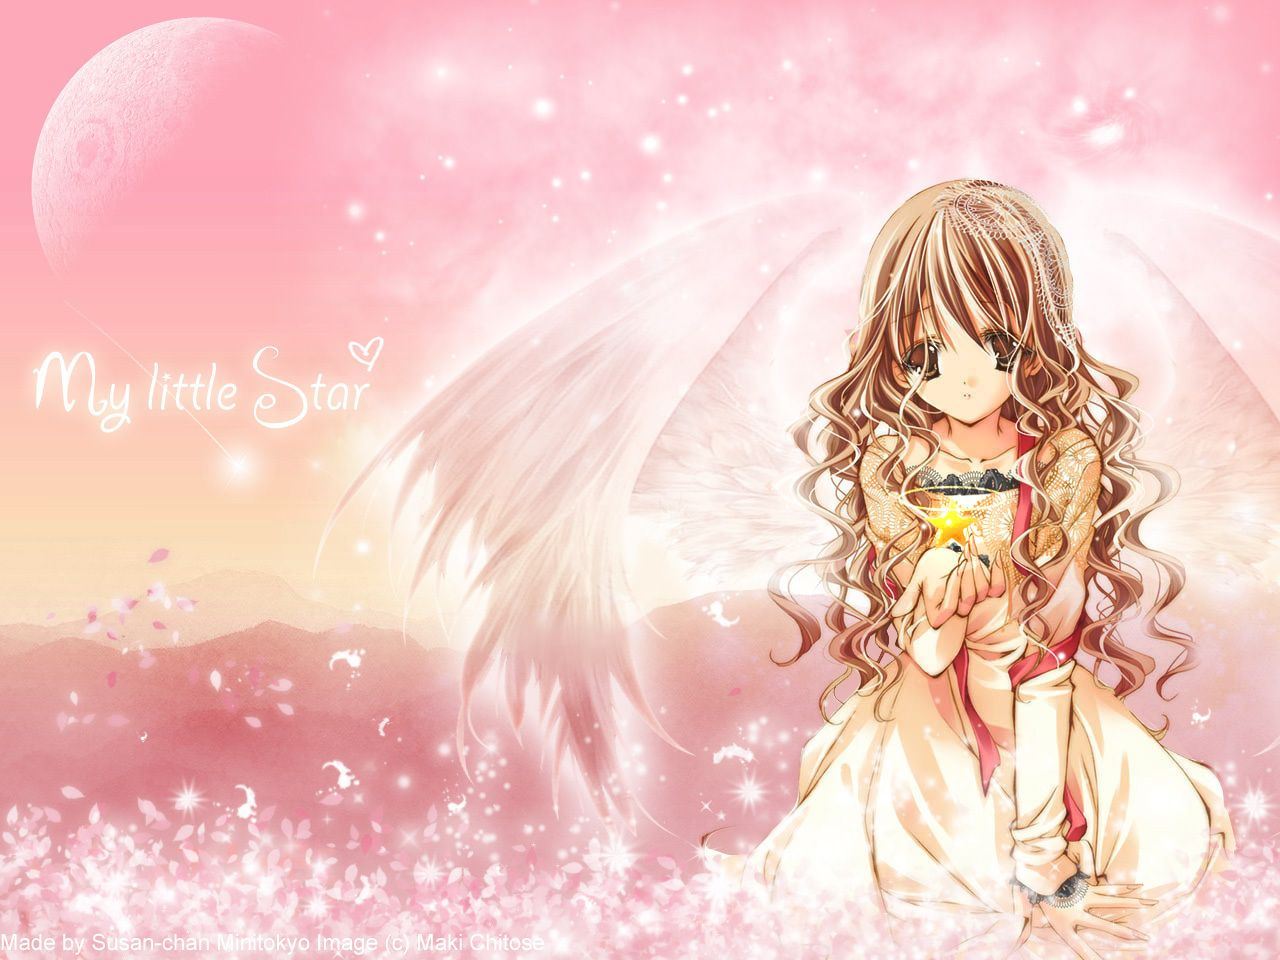 anime-angel-anime-22047311-1280-960.jpg